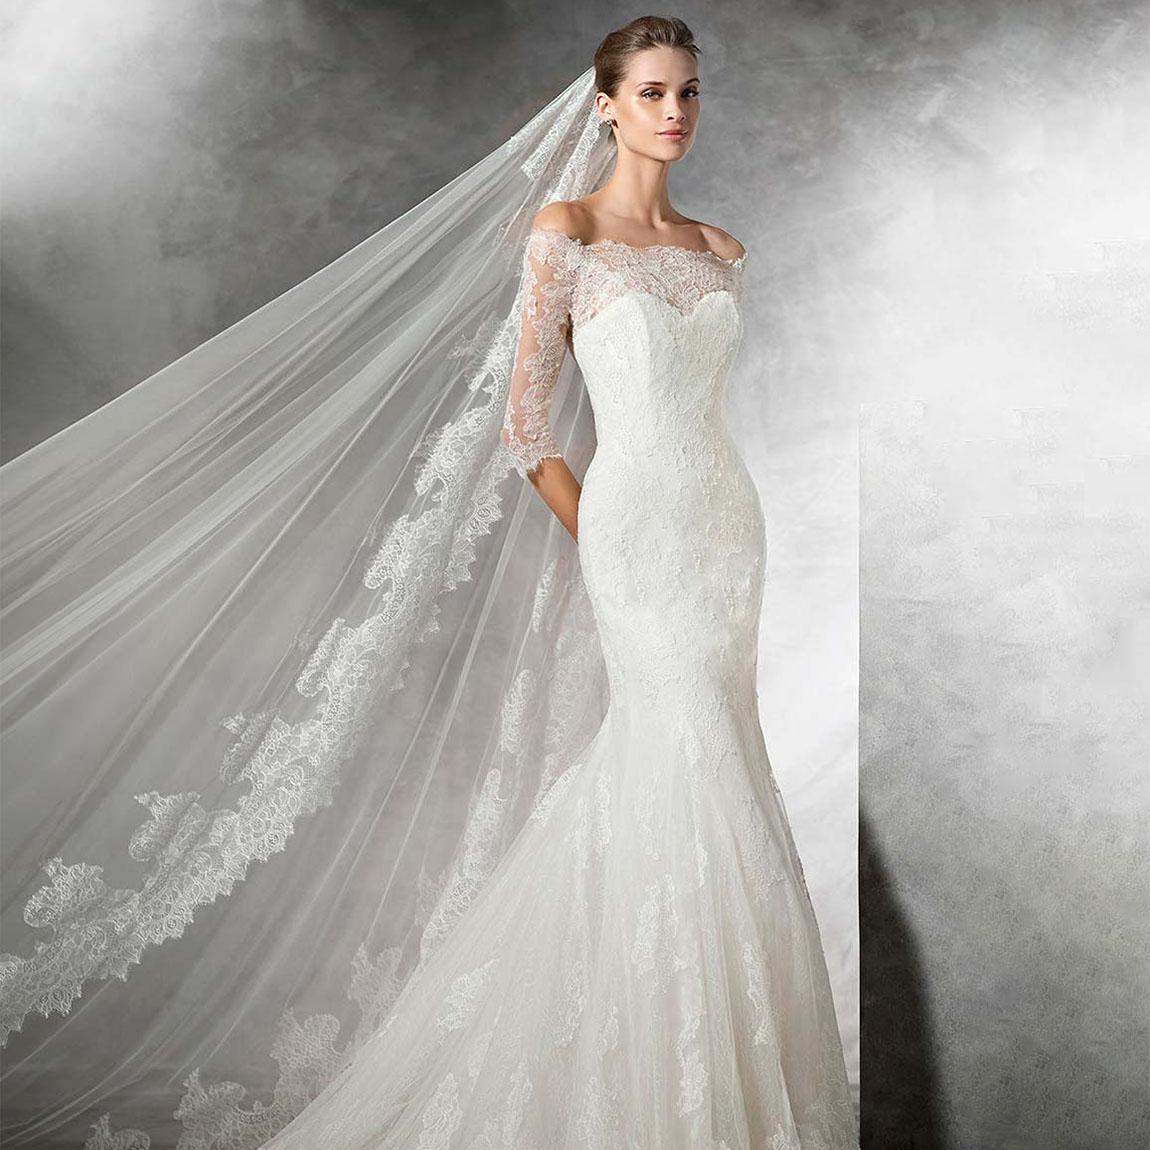 5d6175fb6a7 Свадебное платье Рыбка с руками и длинной фото